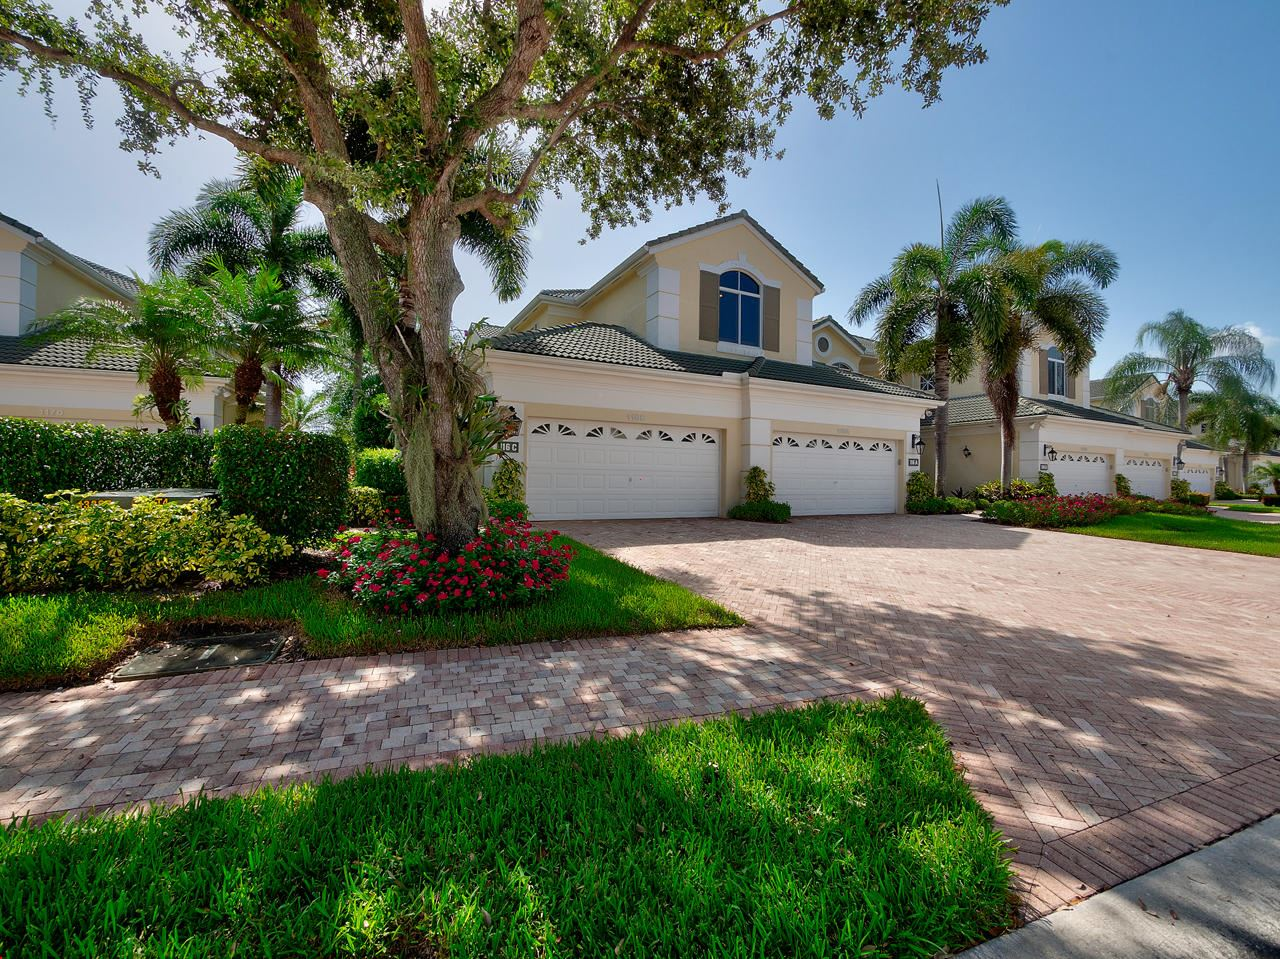 Photo of 116 Palm Point Circle #C, Palm Beach Gardens, FL 33418 (MLS # RX-10651316)